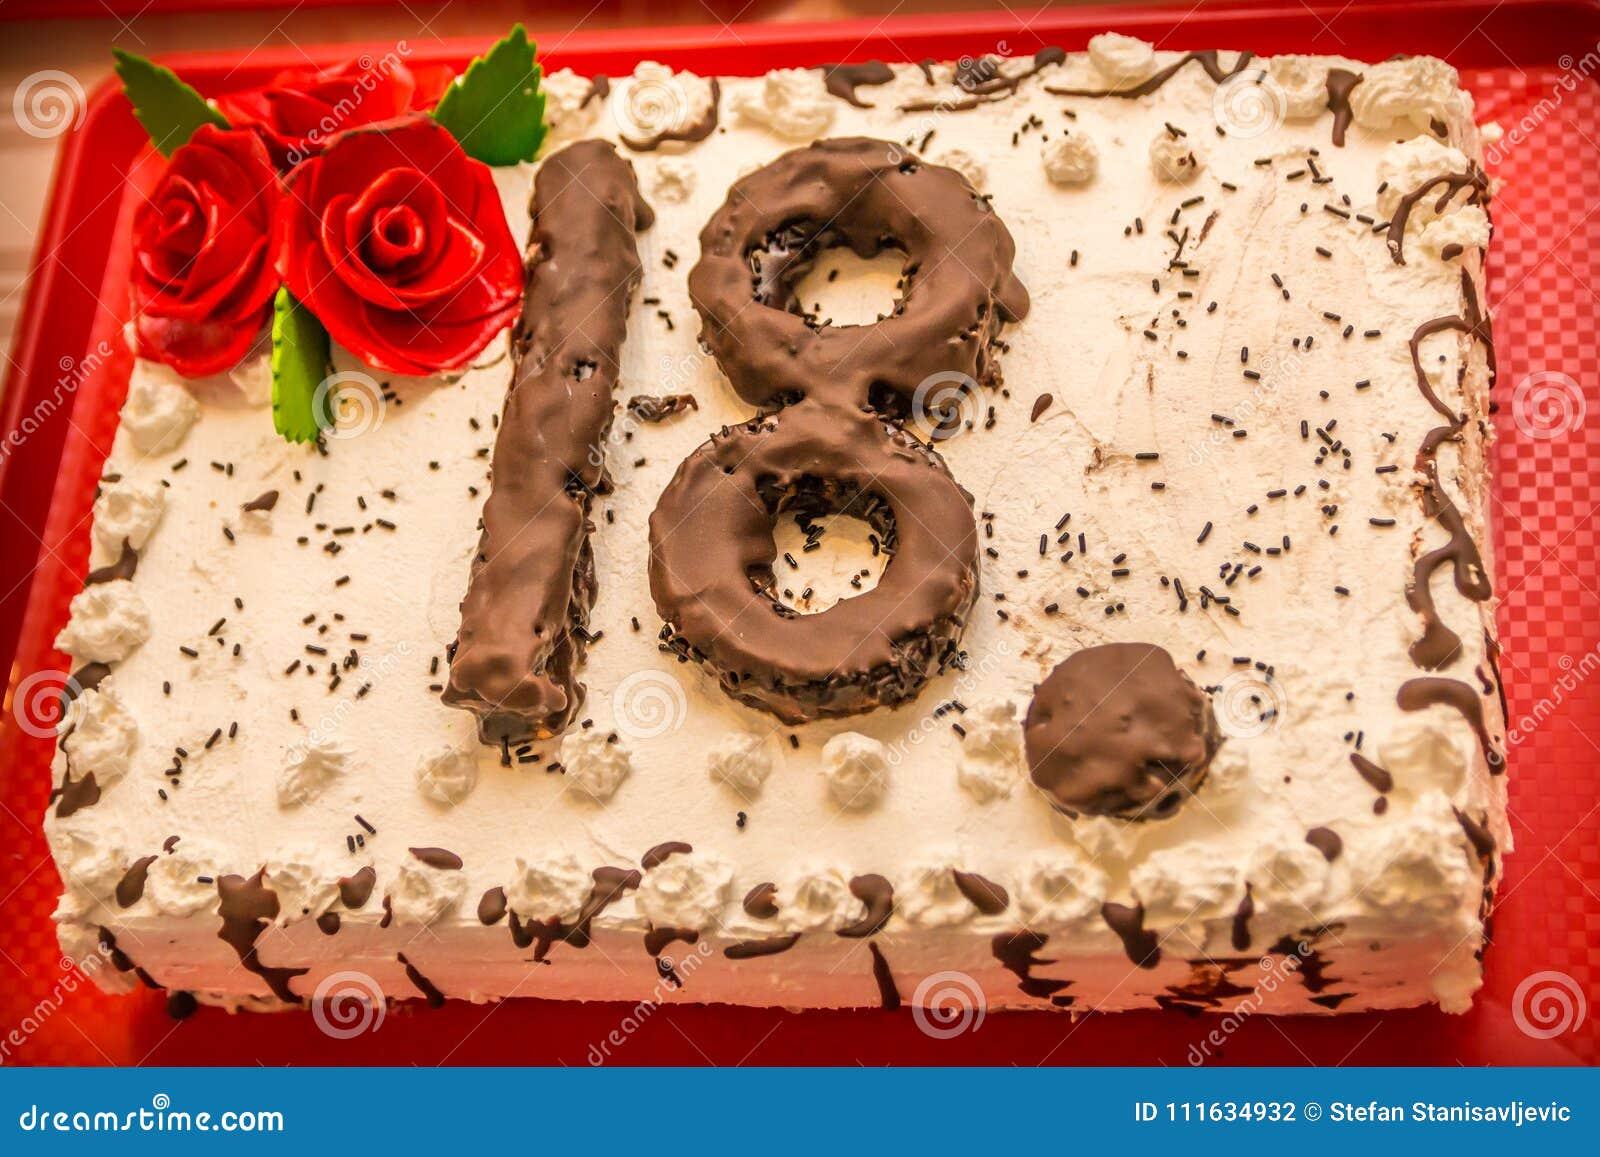 Birthday Cake 18 Stock Photo Image Of Gift Creative